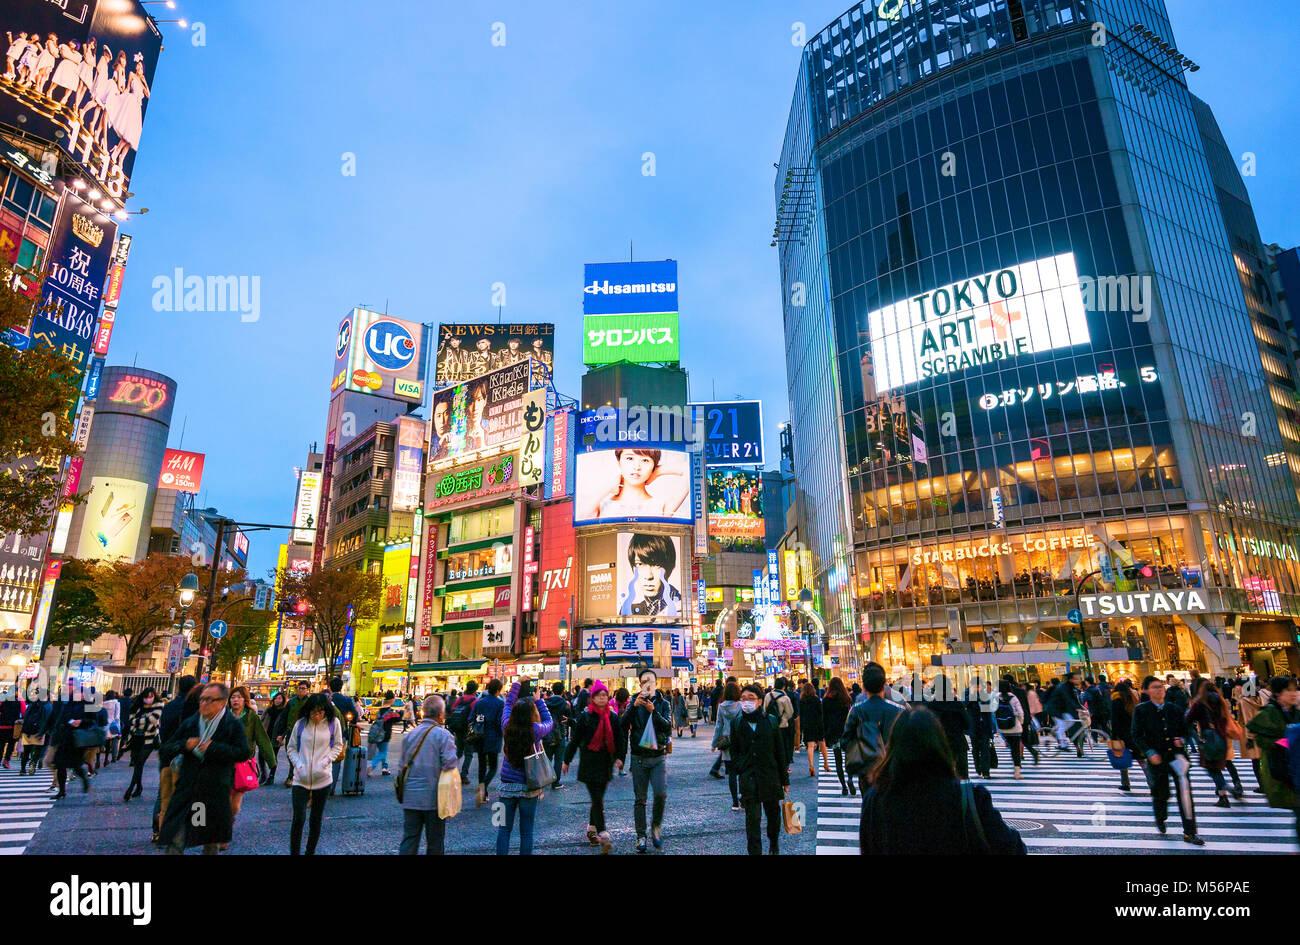 Shibuya Crossing Tokyo Japan Hachiko Square - Stock Image